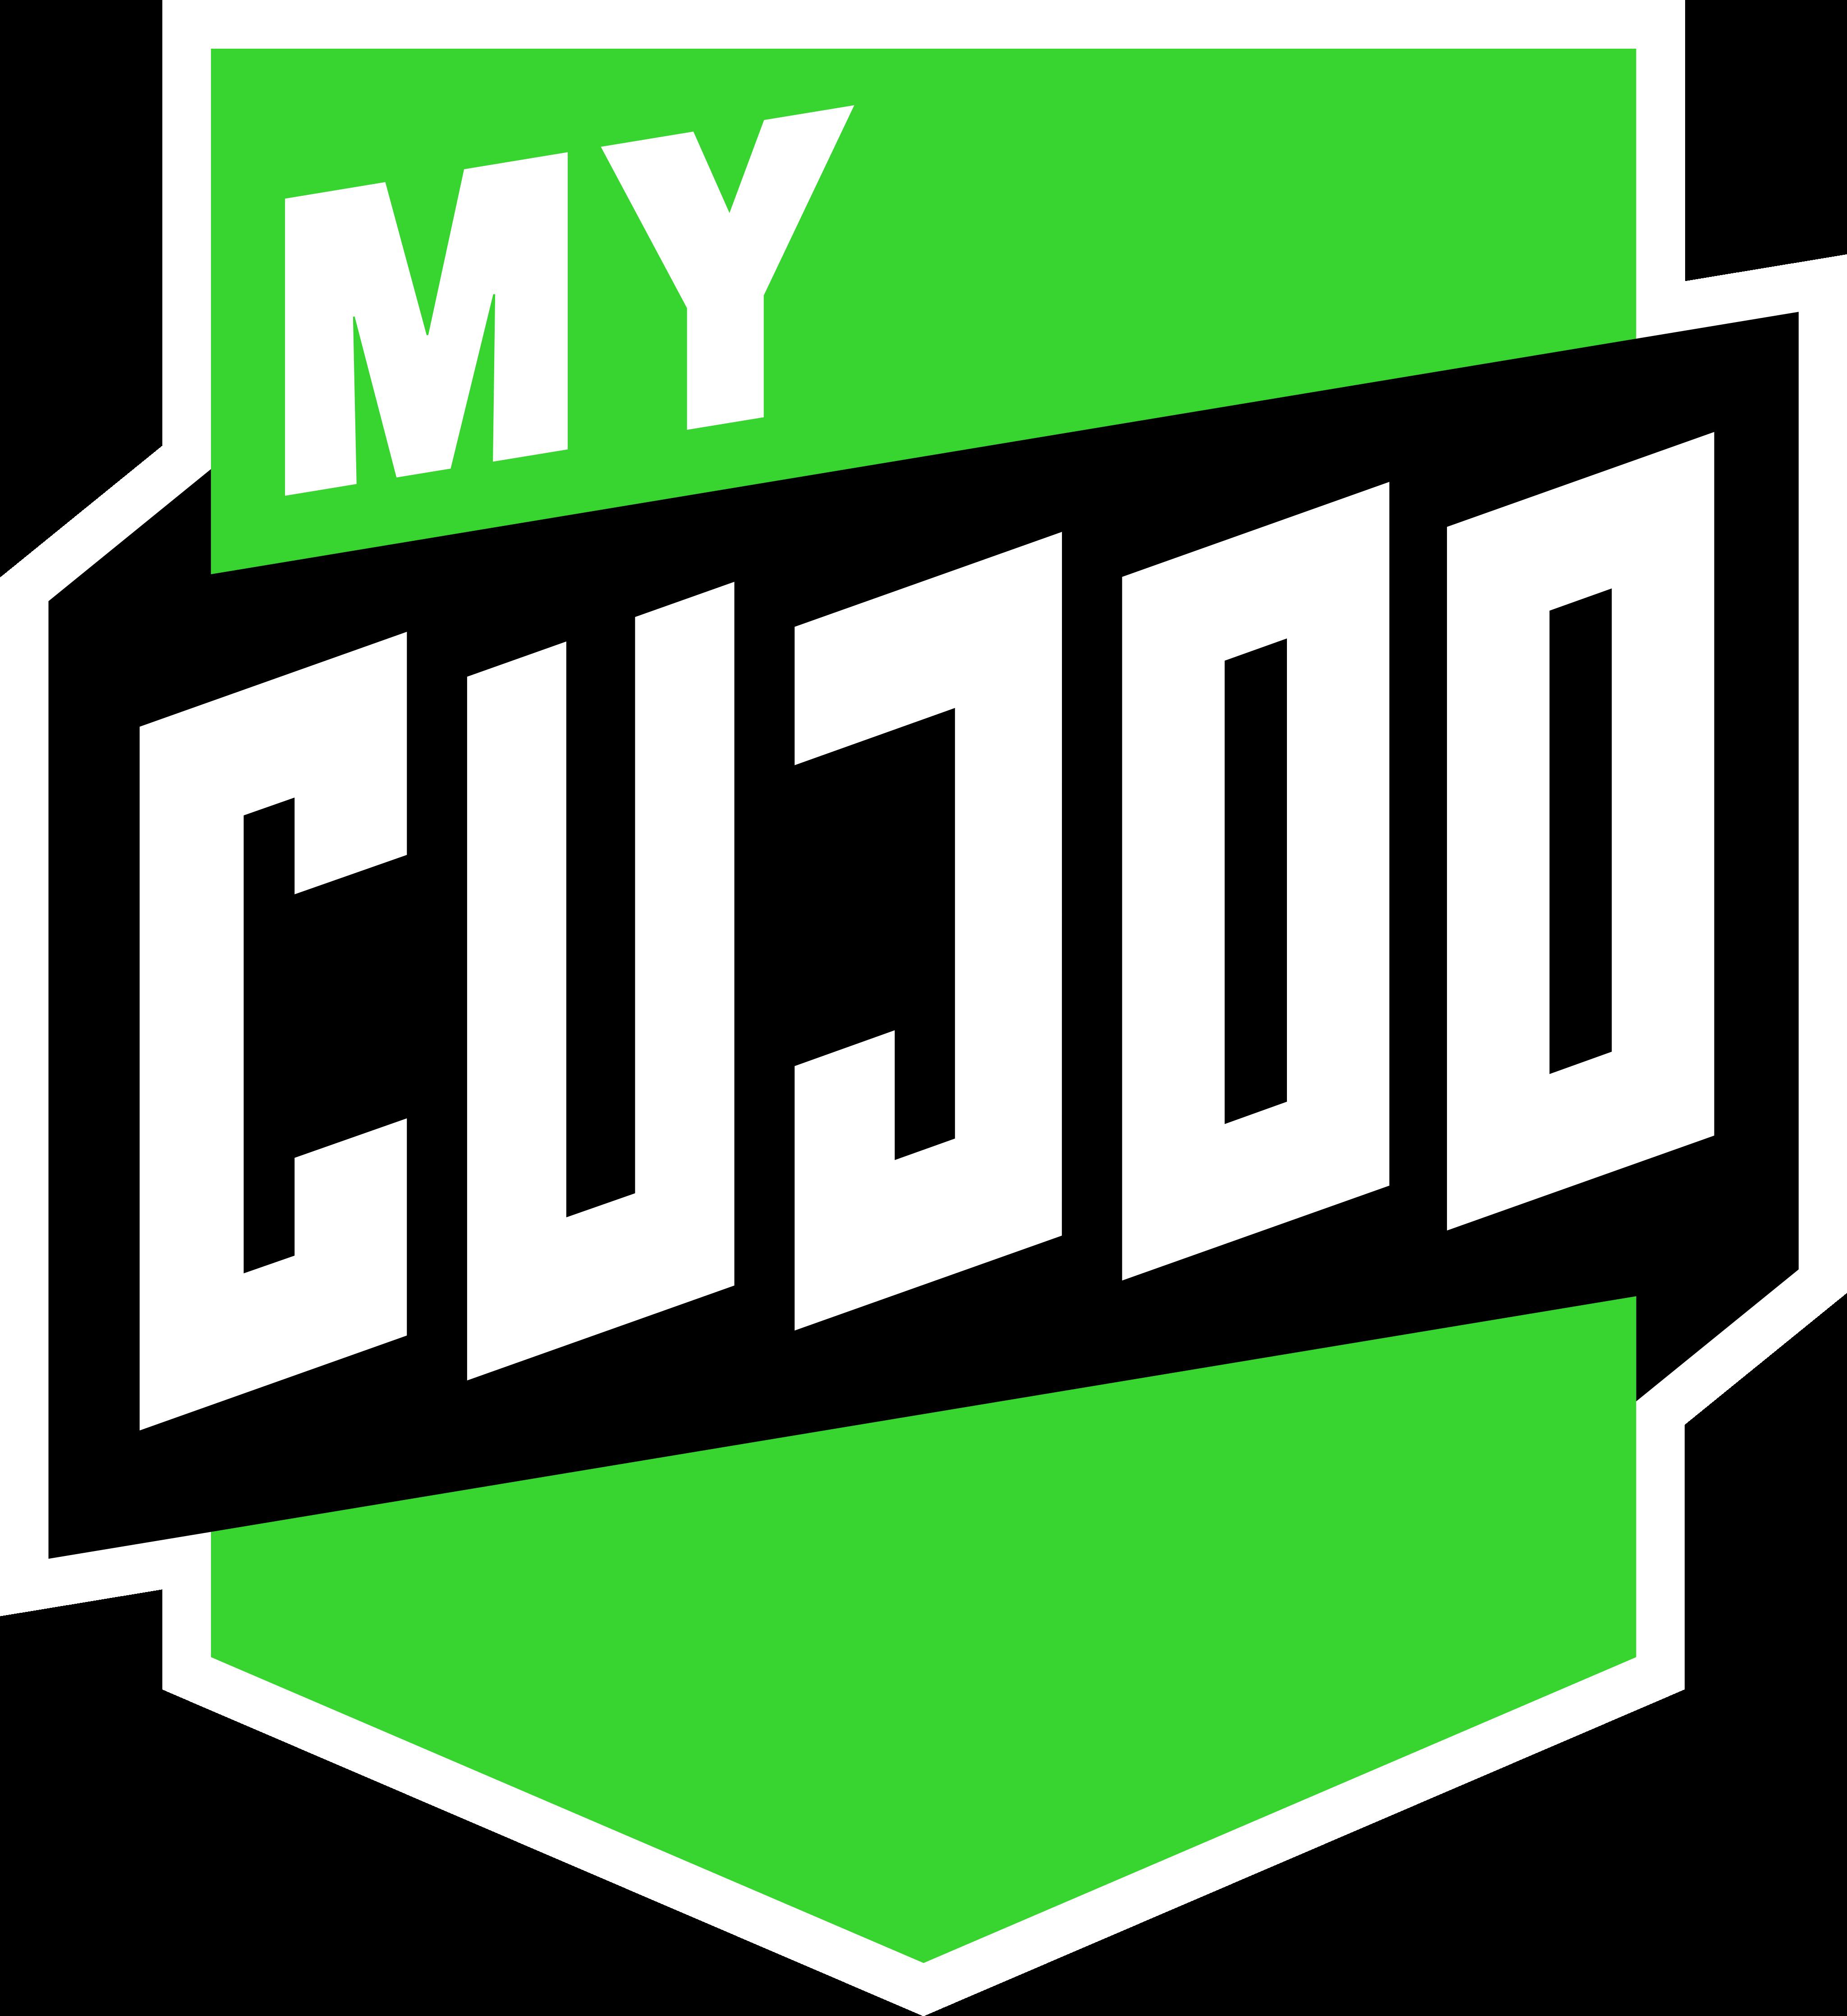 My Cujoo logo.